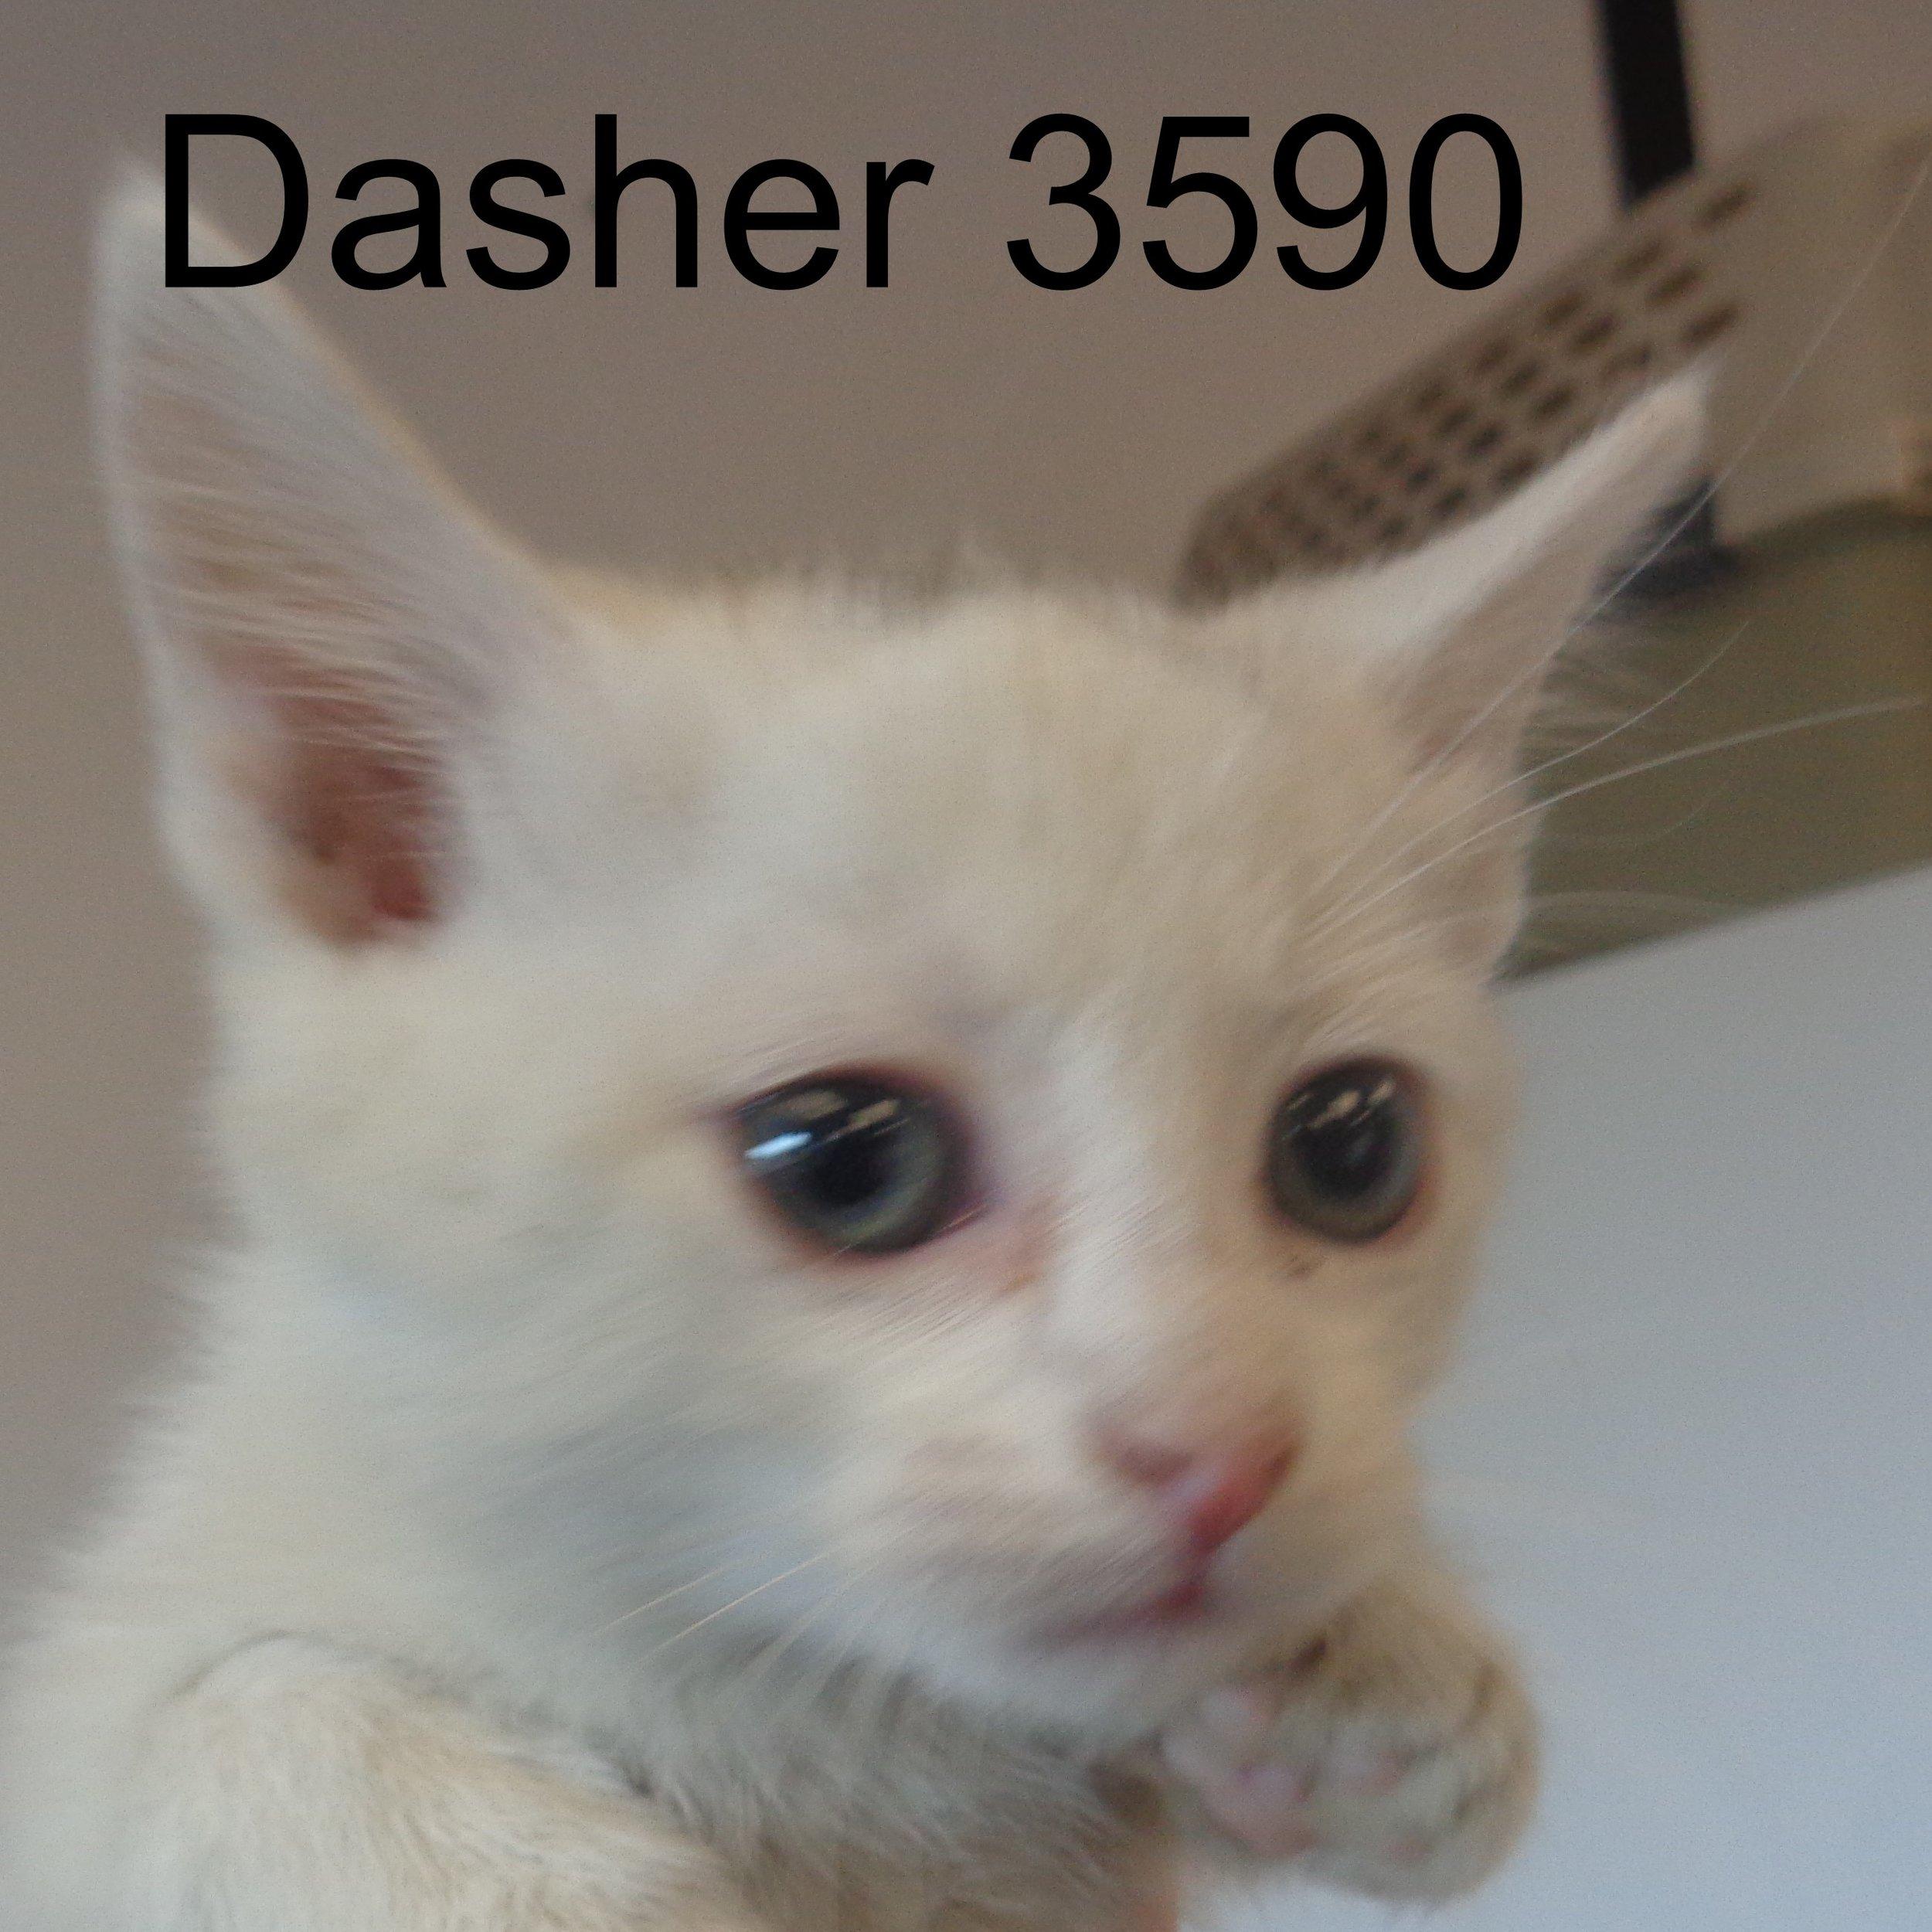 Dasher 3590.JPG